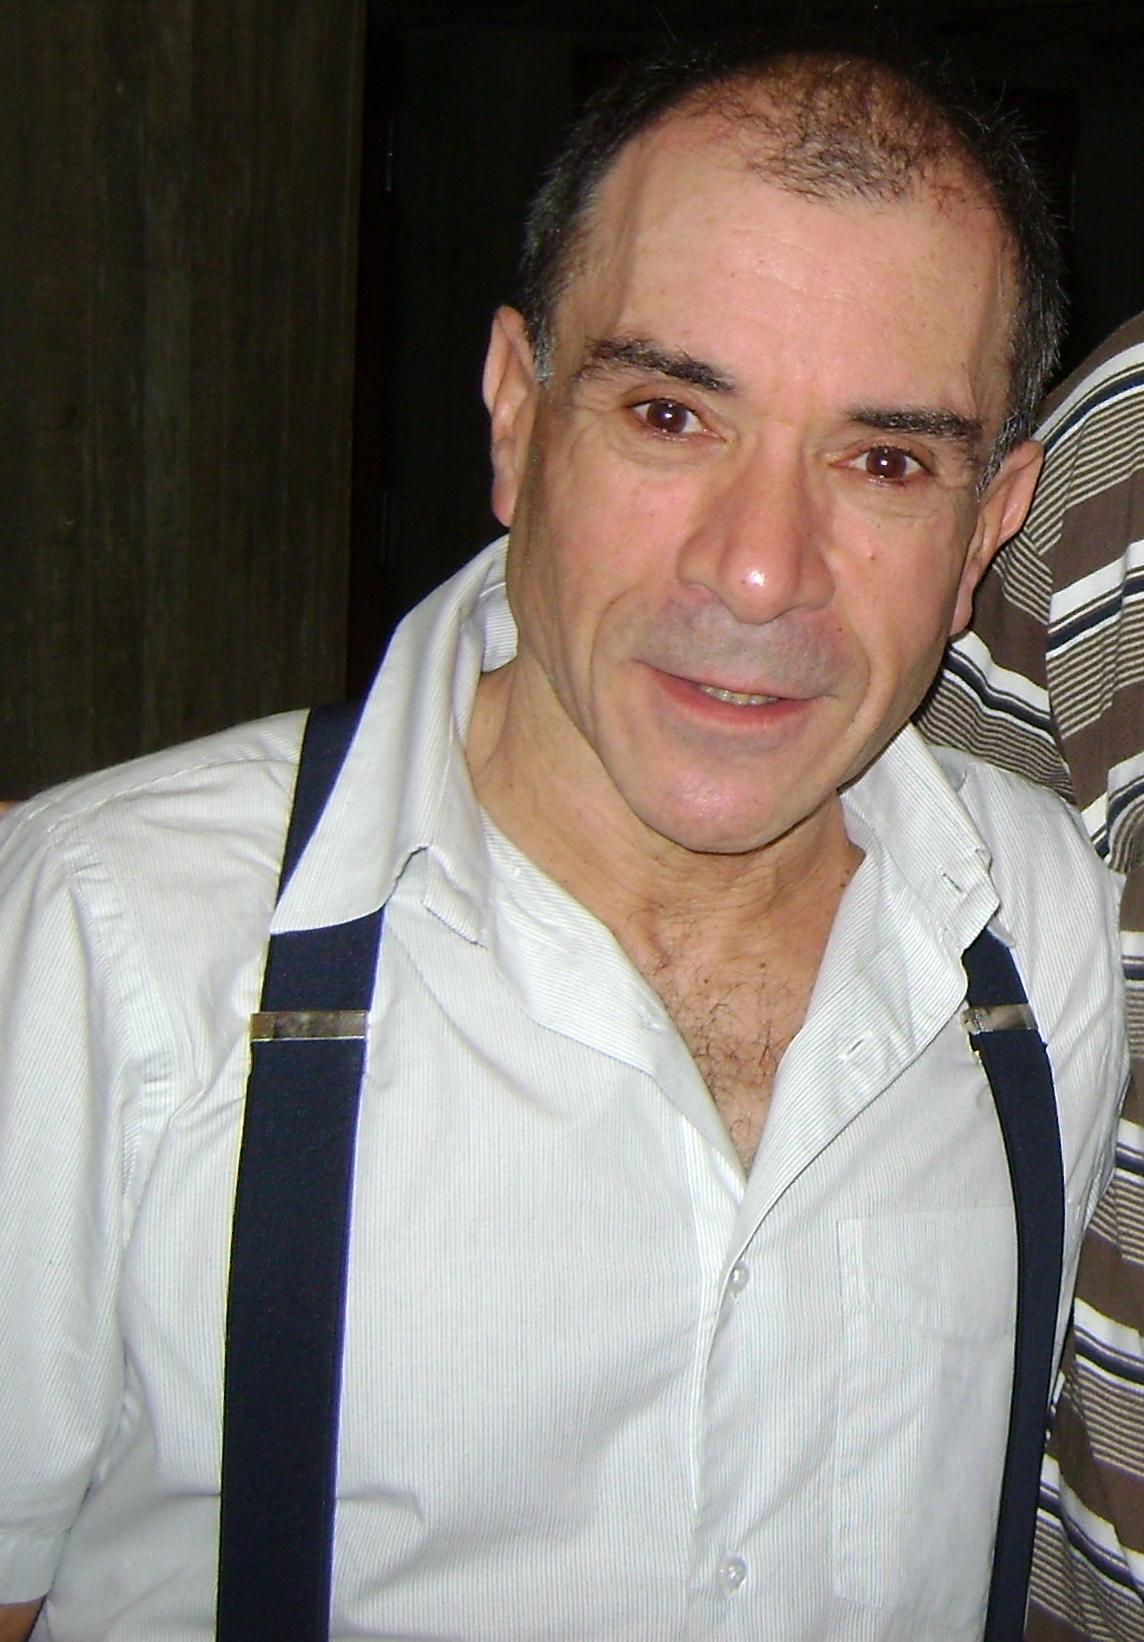 Ricardo Blat